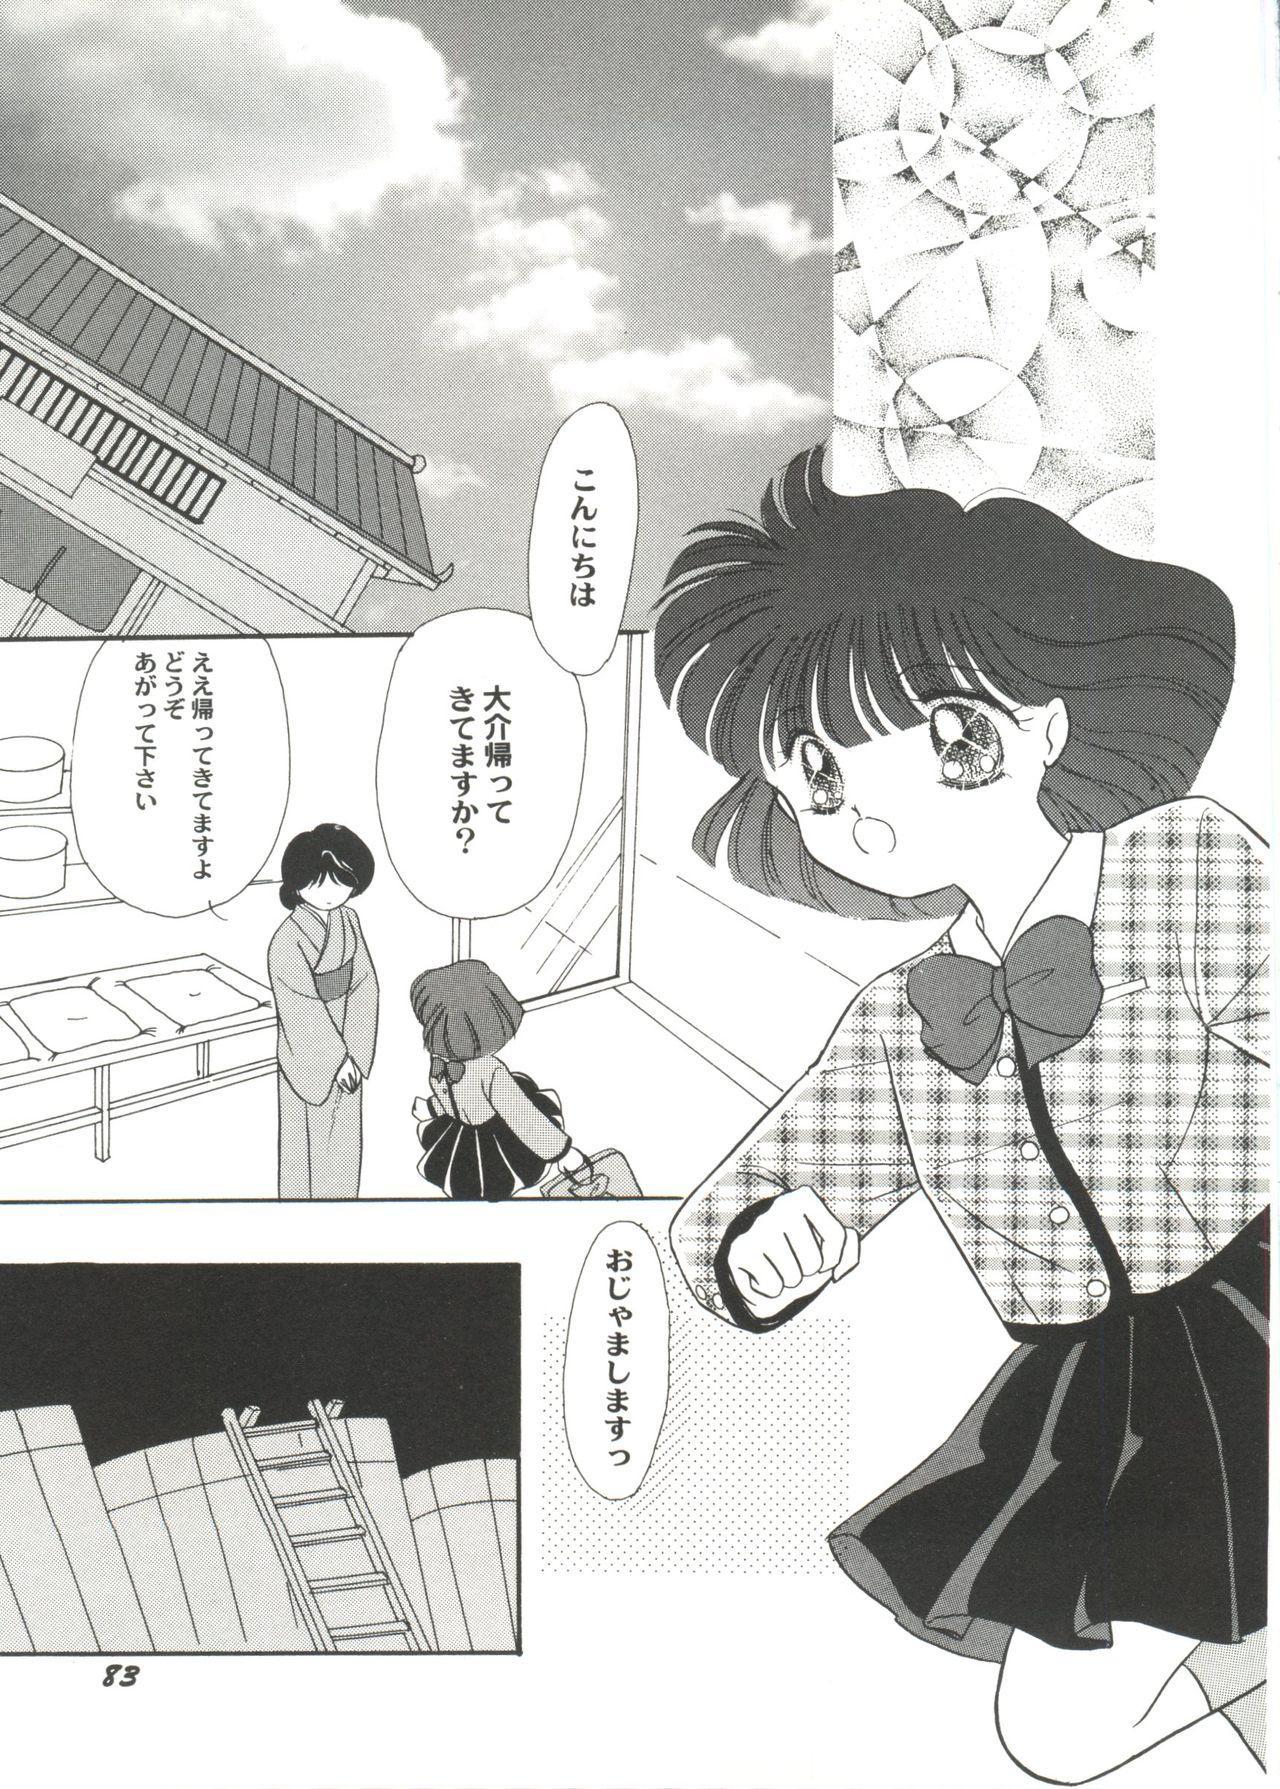 Bishoujo Doujin Peach Club - Pretty Gal's Fanzine Peach Club 9 84